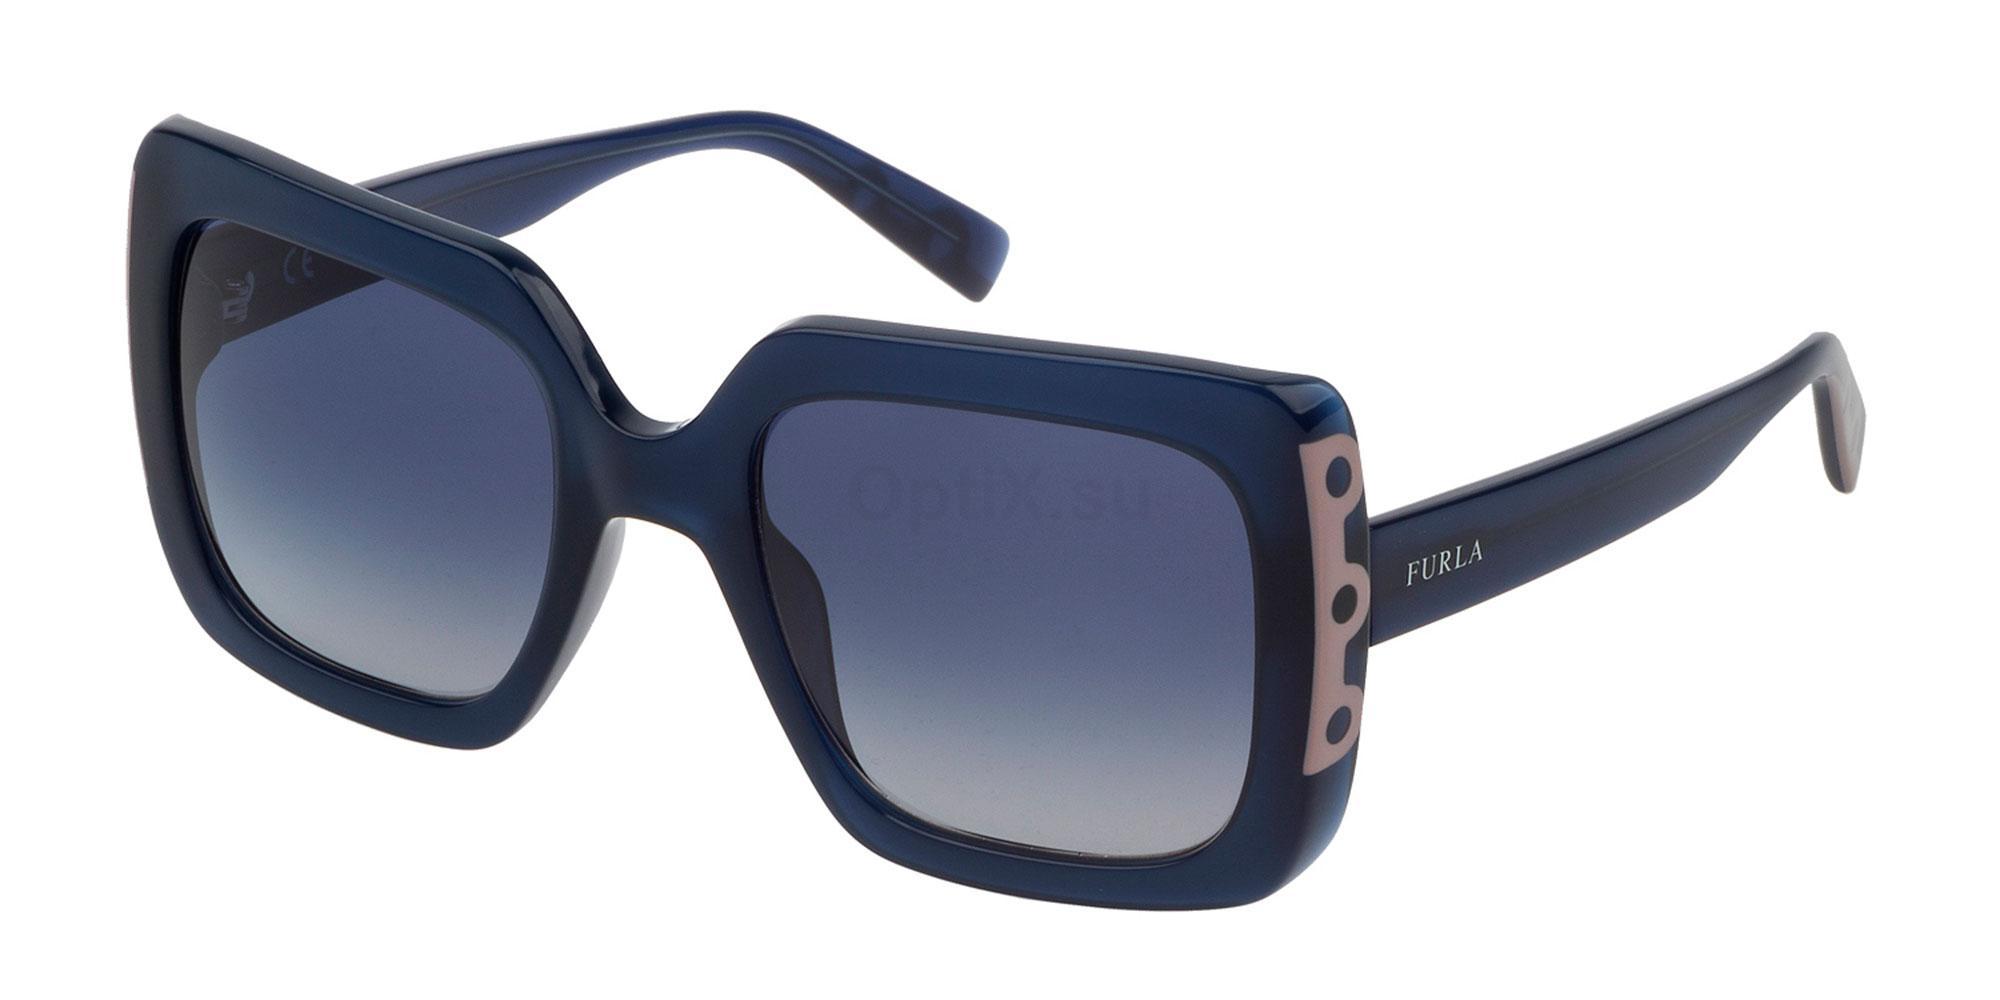 03GR SFU239 Sunglasses, Furla